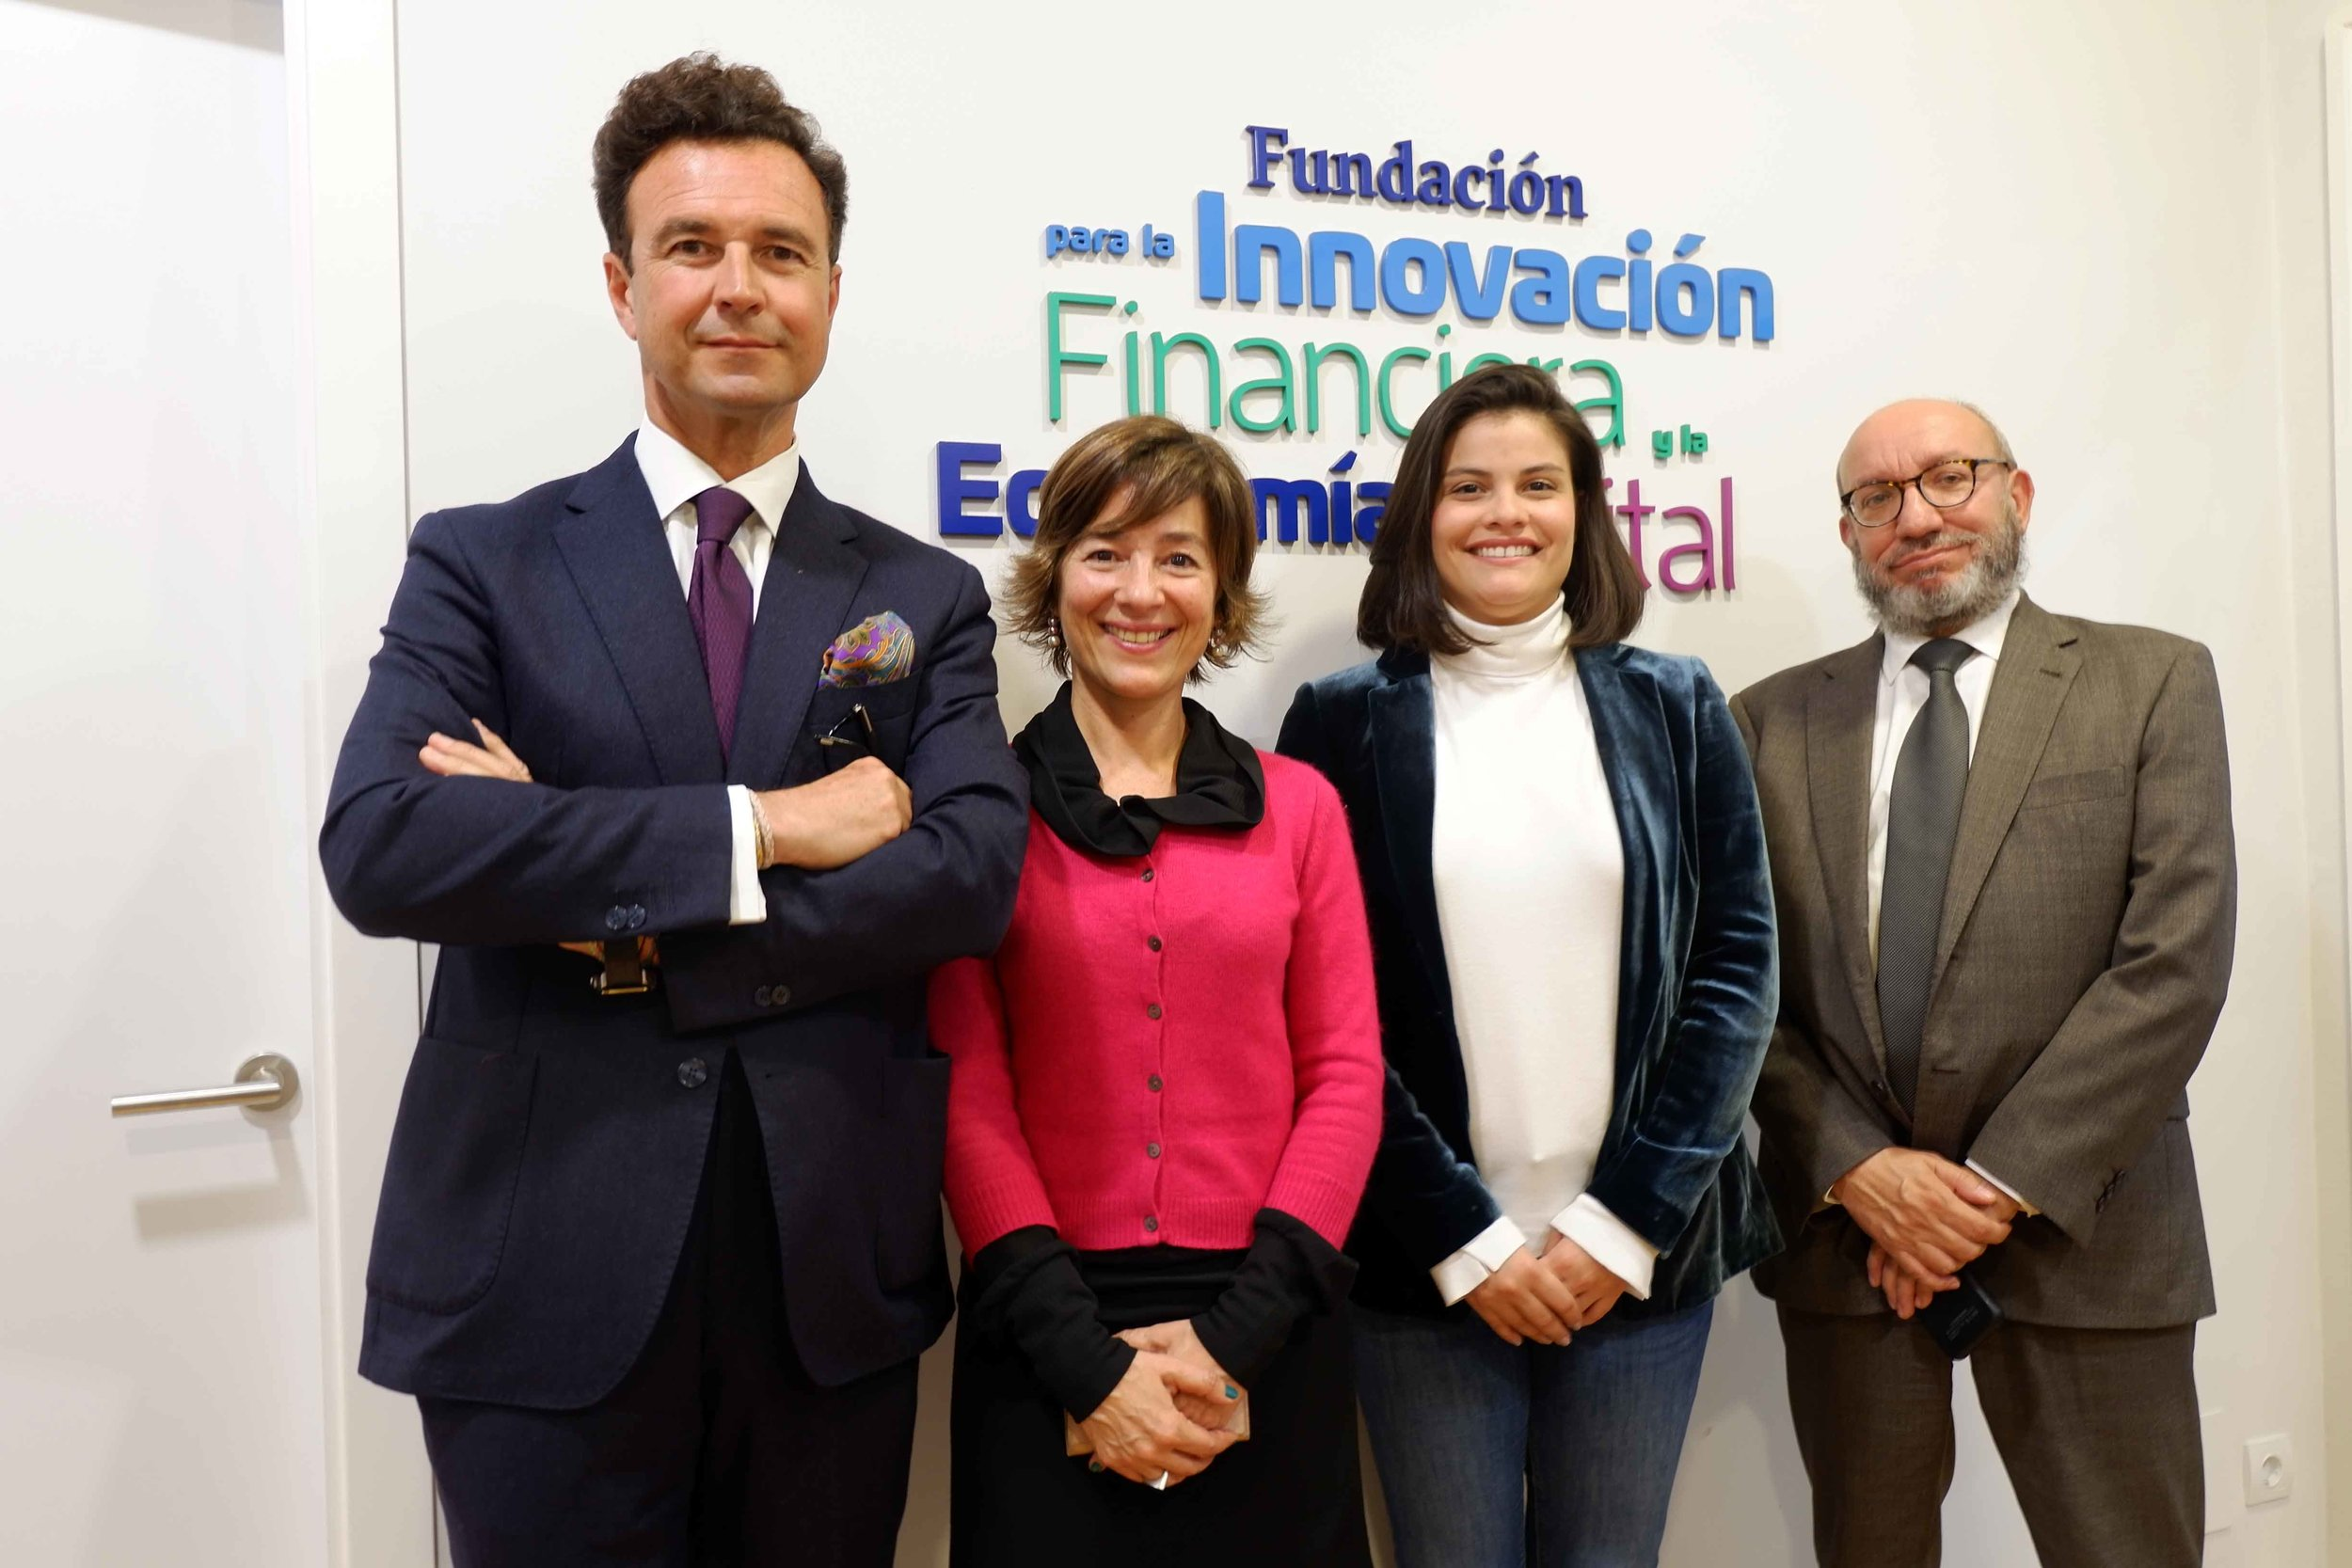 El presidente de FIFED, Vicente J. García Gil, junto a Andréia Castellan (GH Crecemos), María Laura Mosqueda (TechHeroX) y Félix Benavides (GH Crecemos).